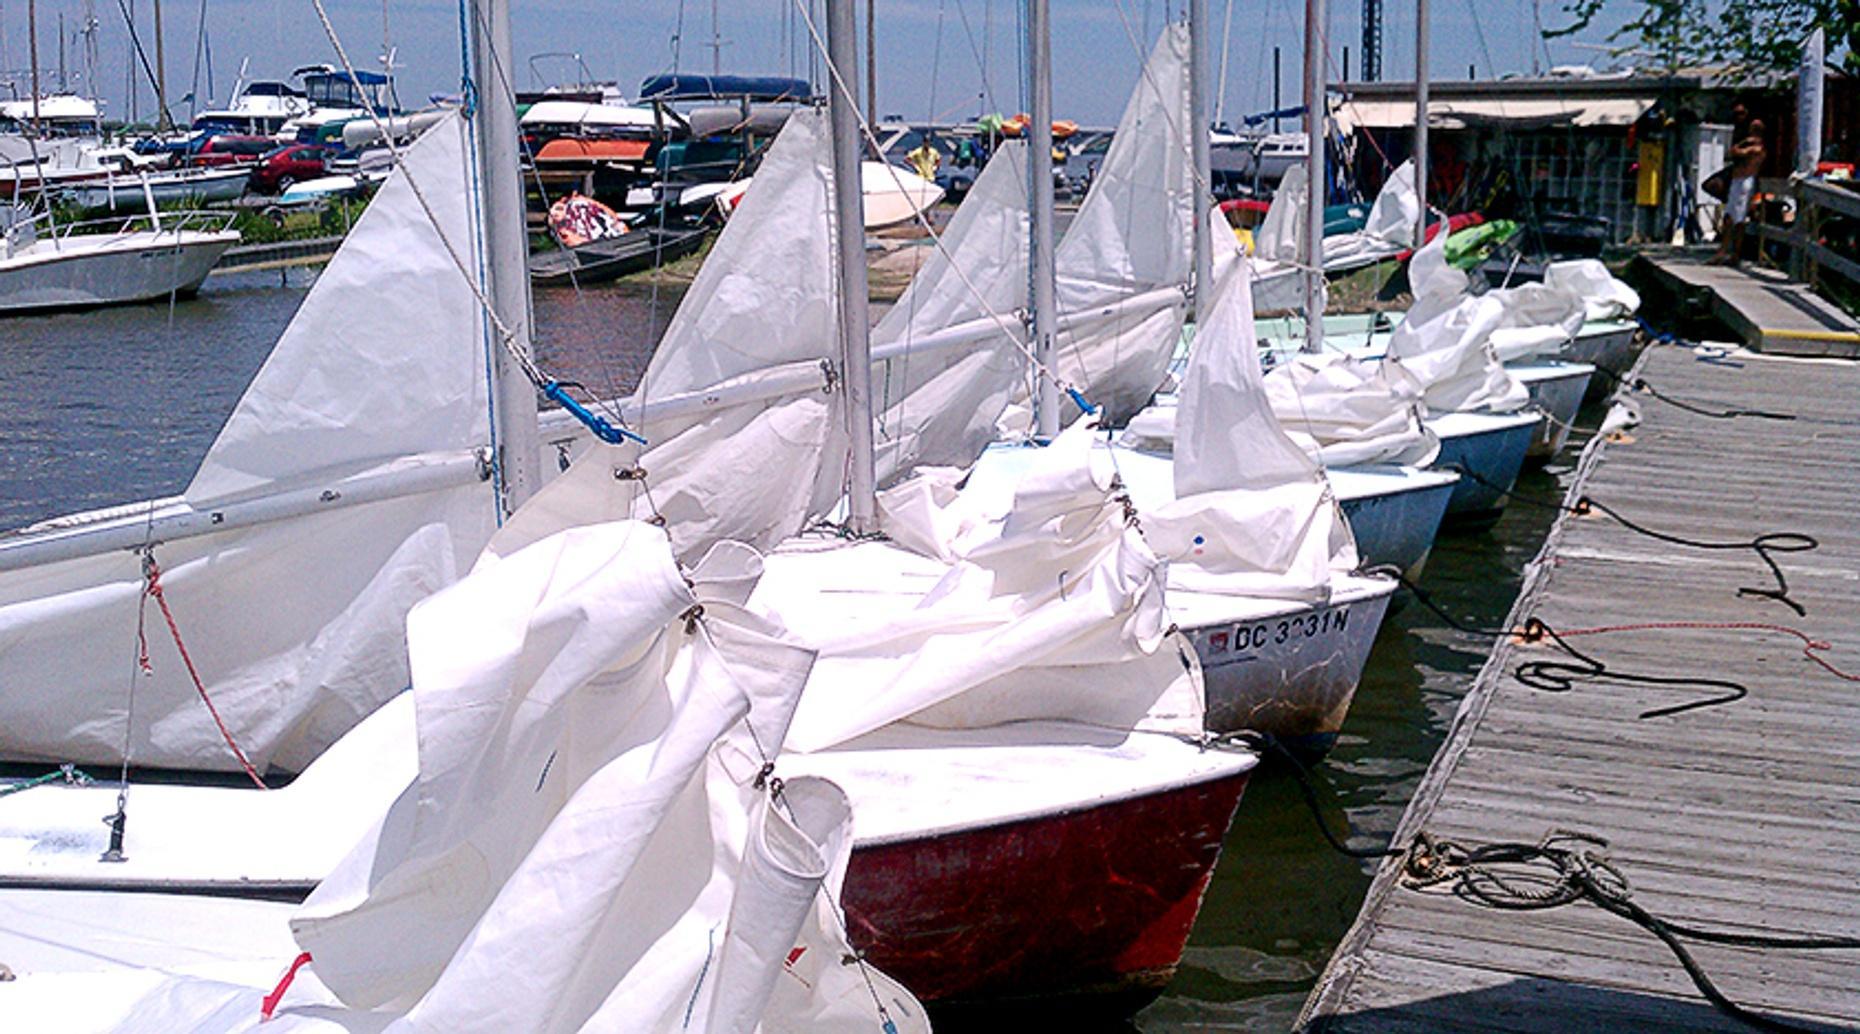 Potomac River Sunfish Rental